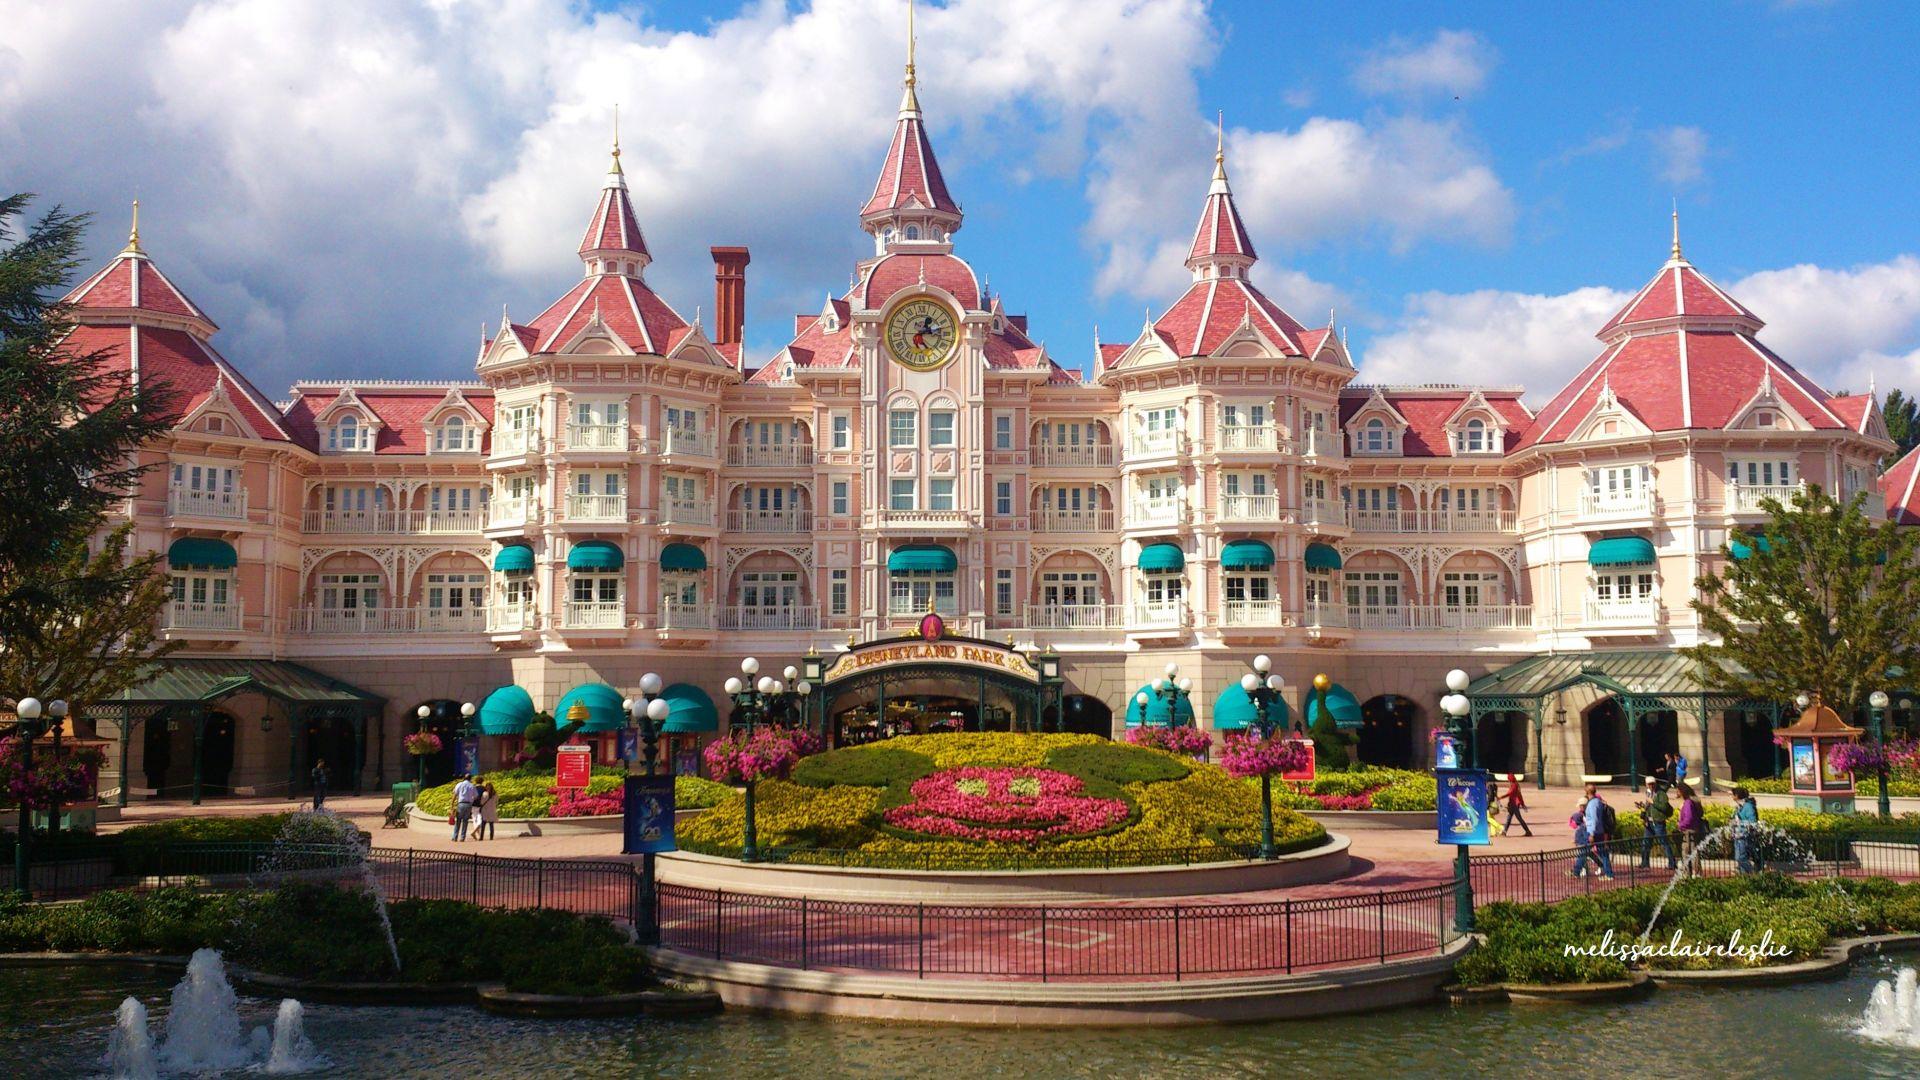 Disneyland Hotel Paris France Europe Best Hotels Travel Tourism